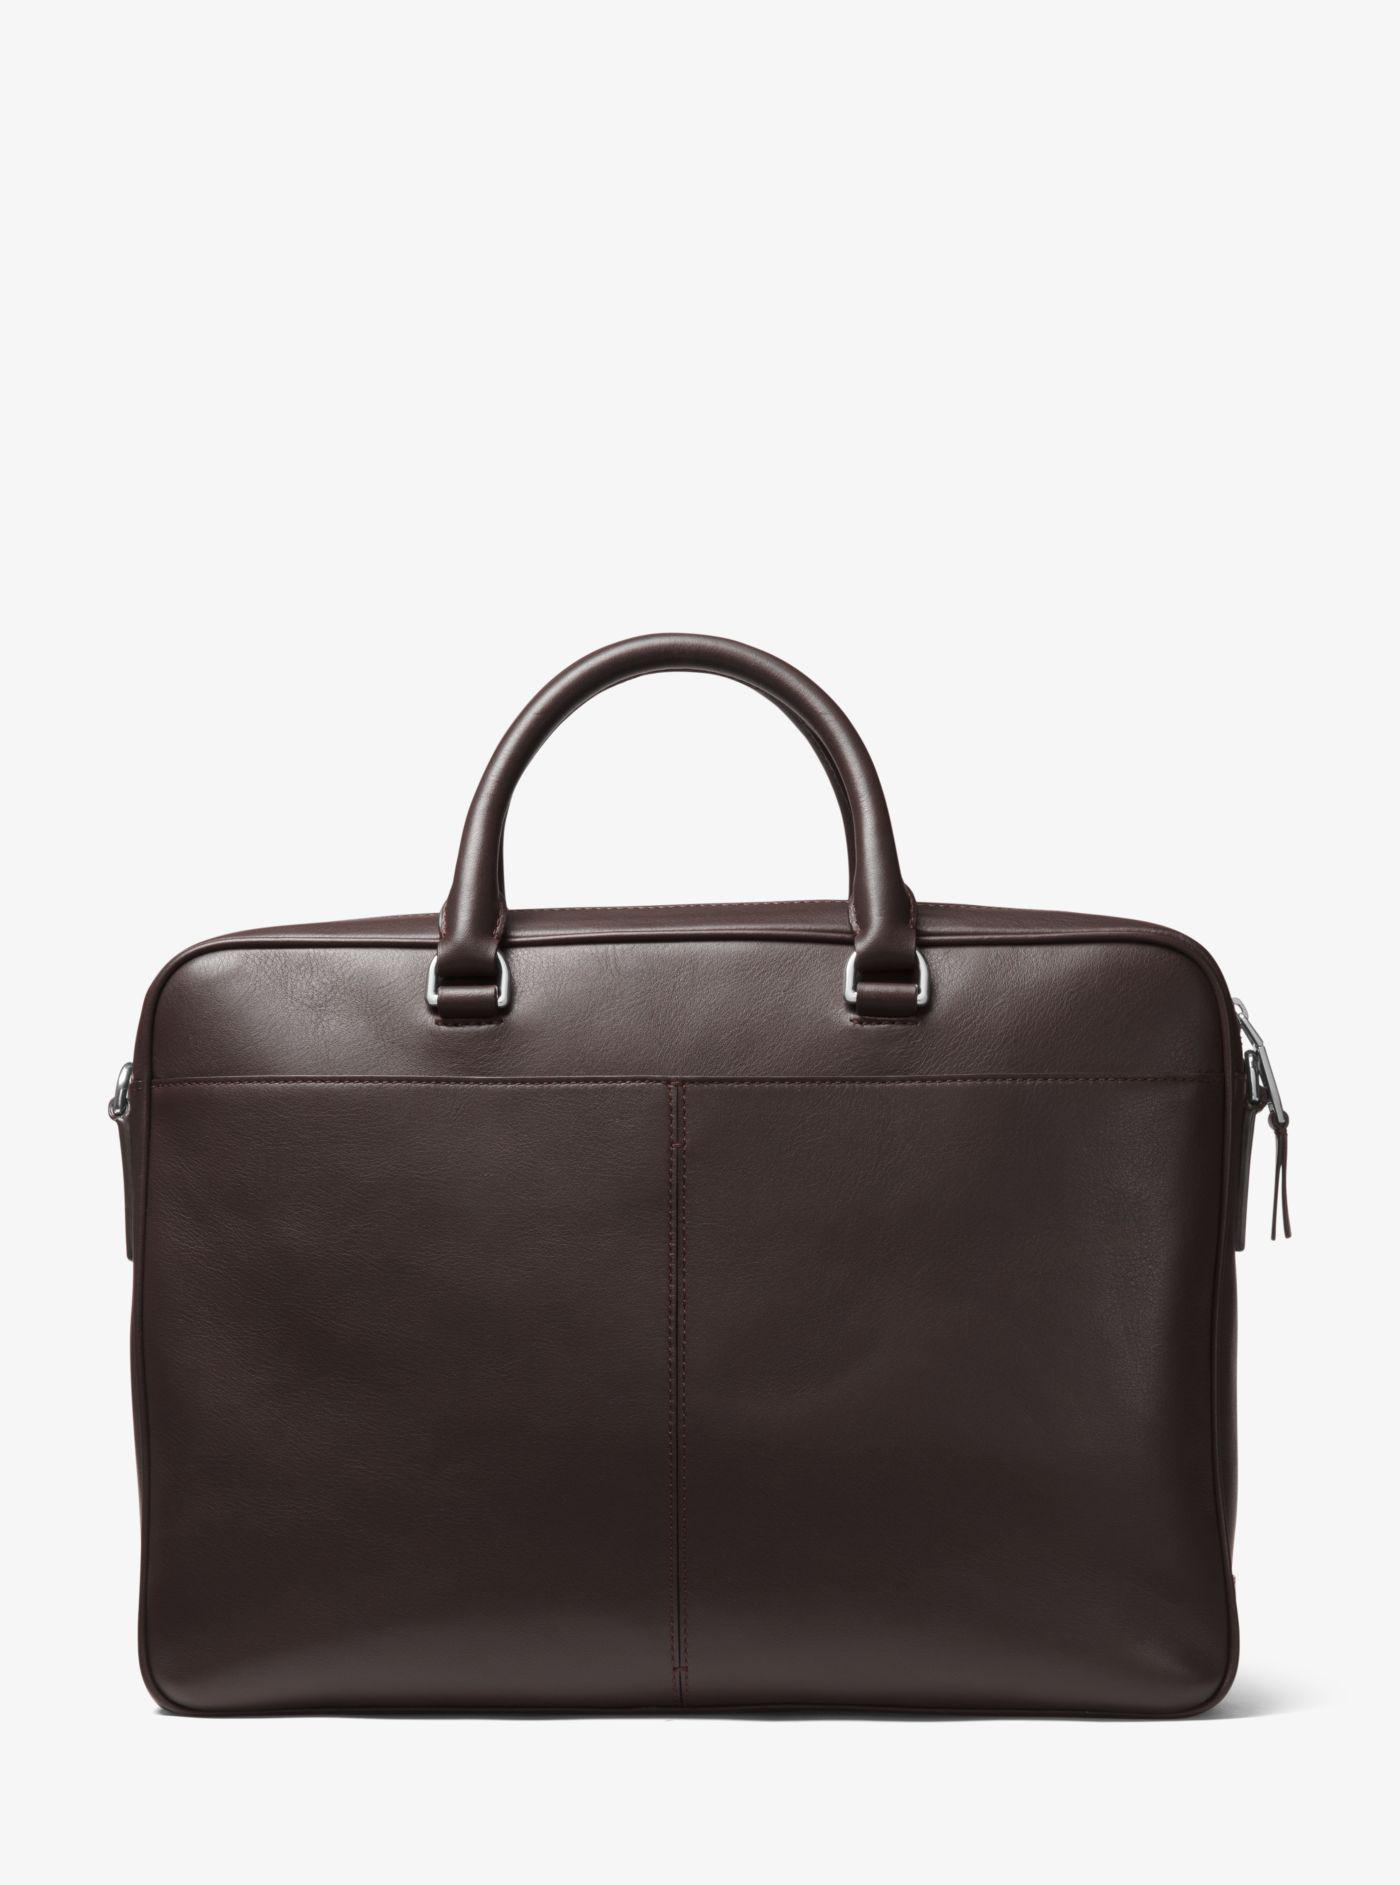 3613da9c8ea8 Lyst - Michael Kors Odin Large Leather Briefcase in Brown for Men